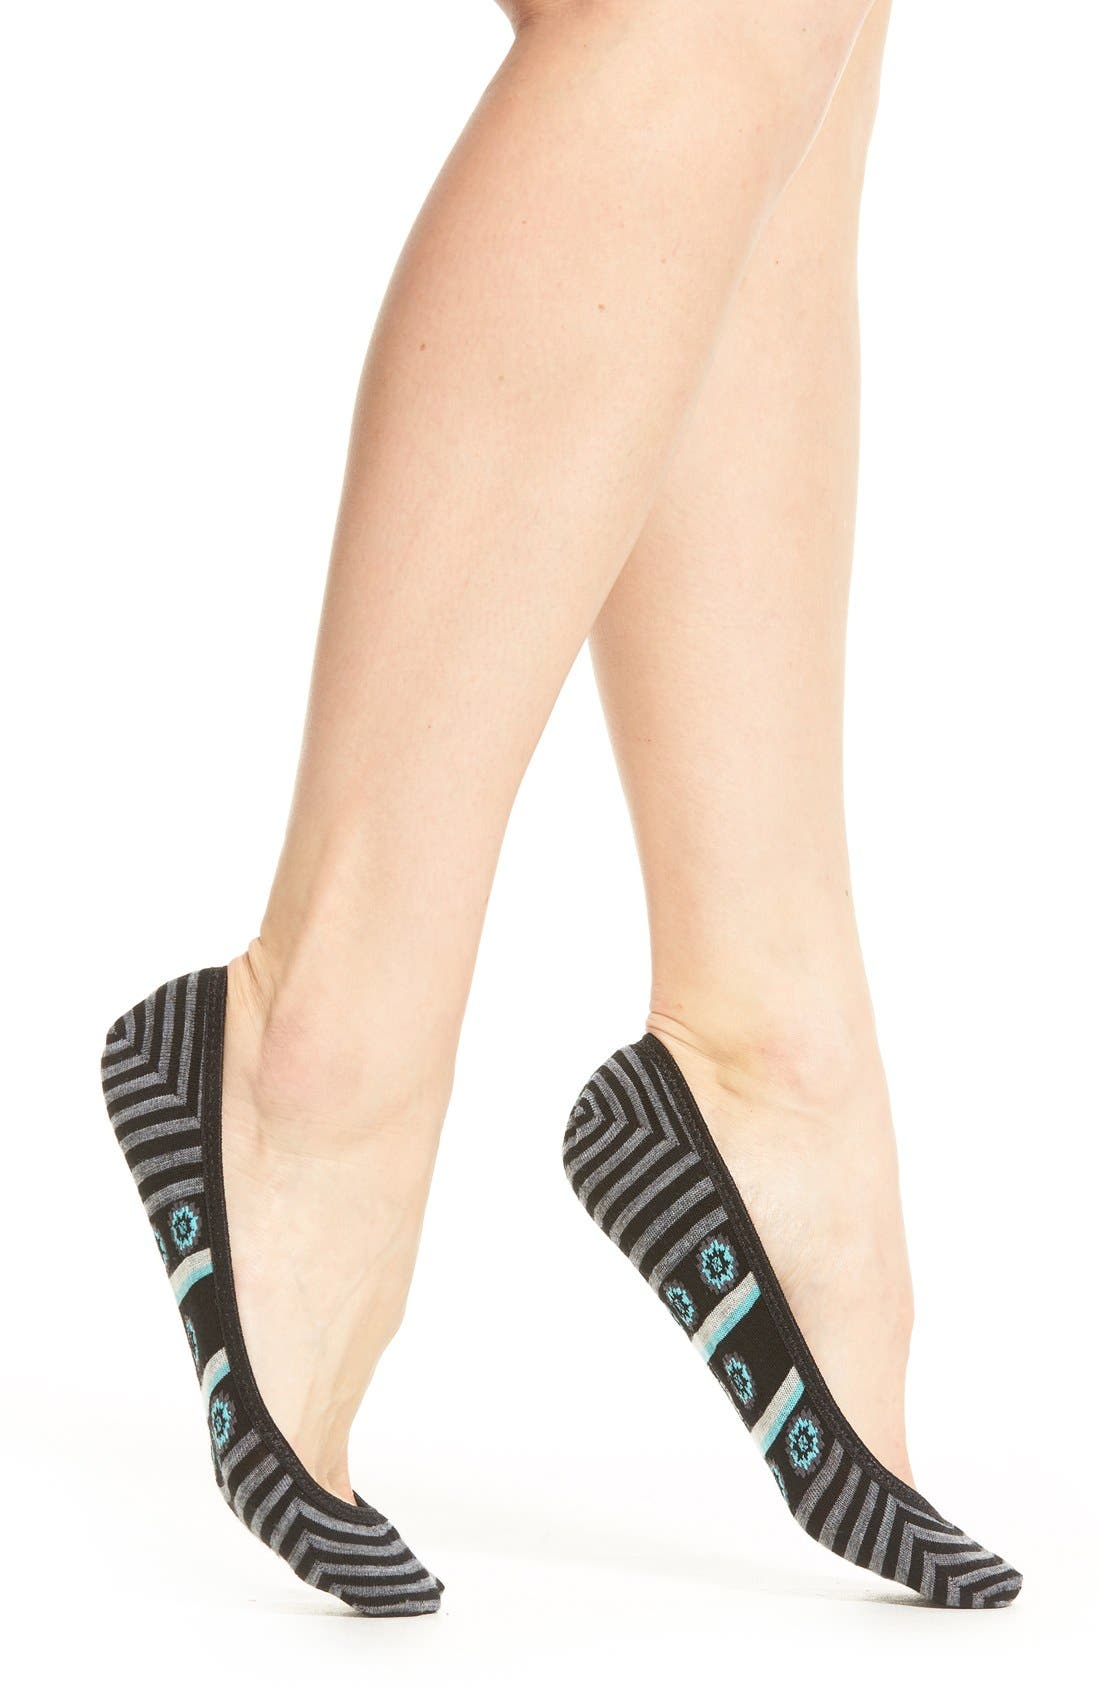 SMARTWOOL 'Sleuth - Dazed Dandelion' Liner Socks